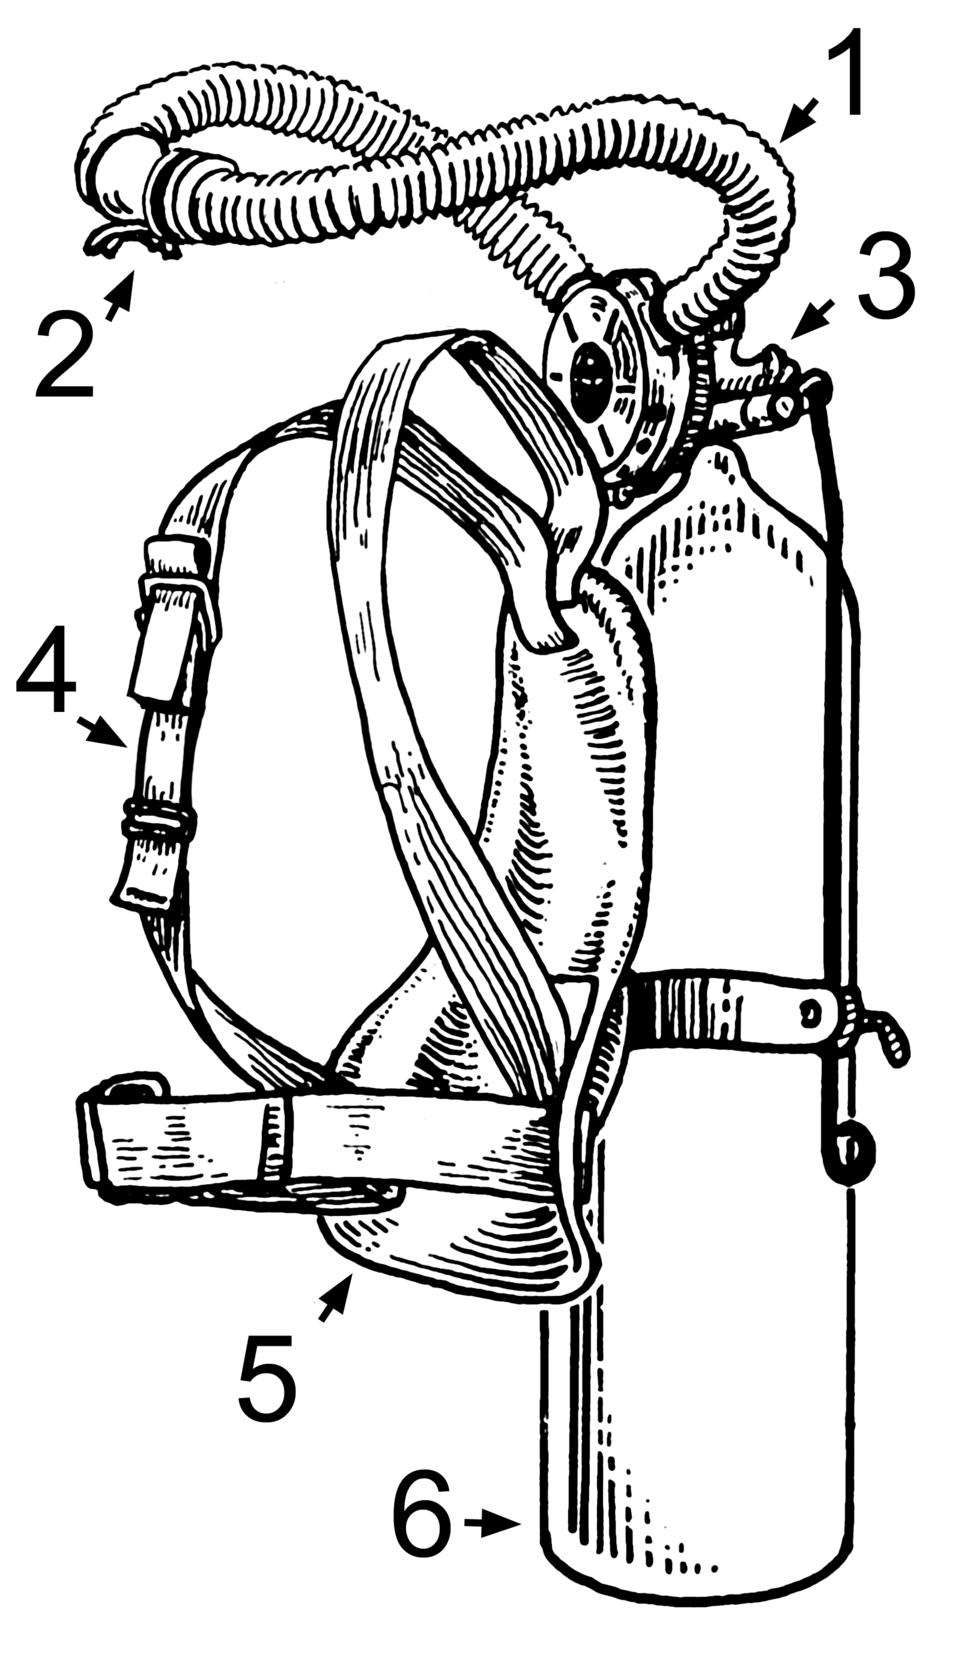 Aqualung (PSF)